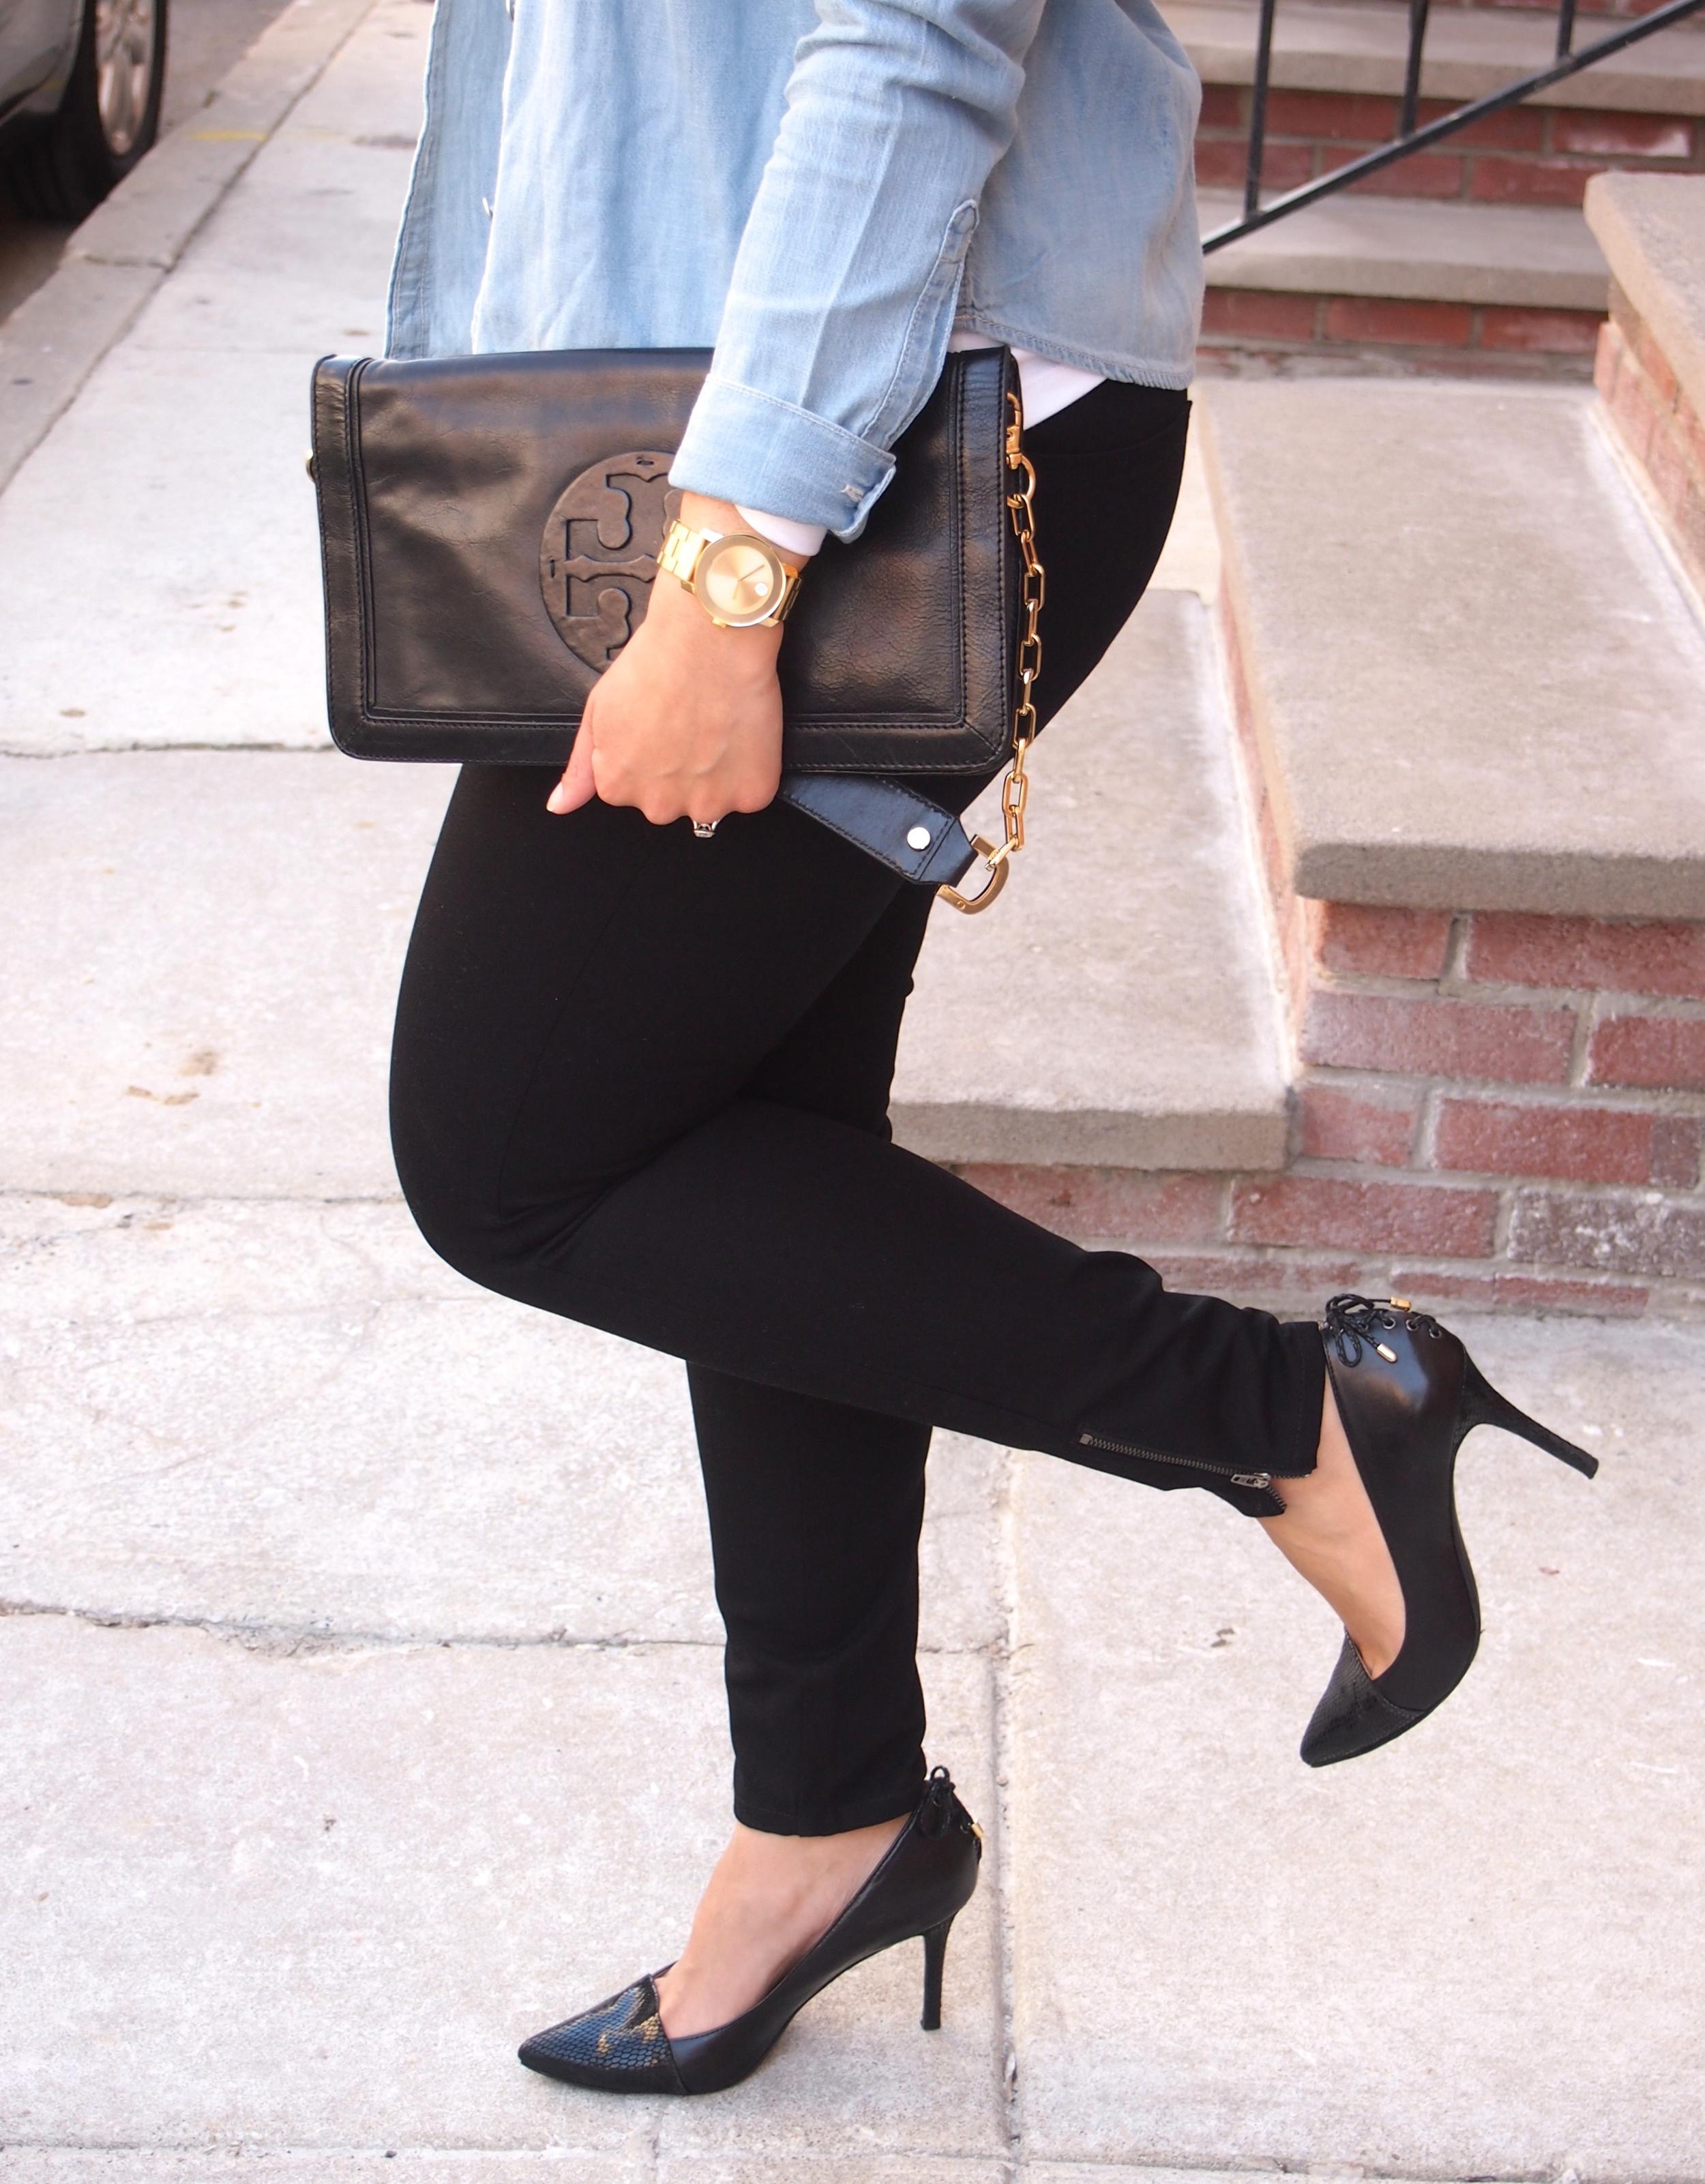 Chambray Shirt with Comfy Black Pants